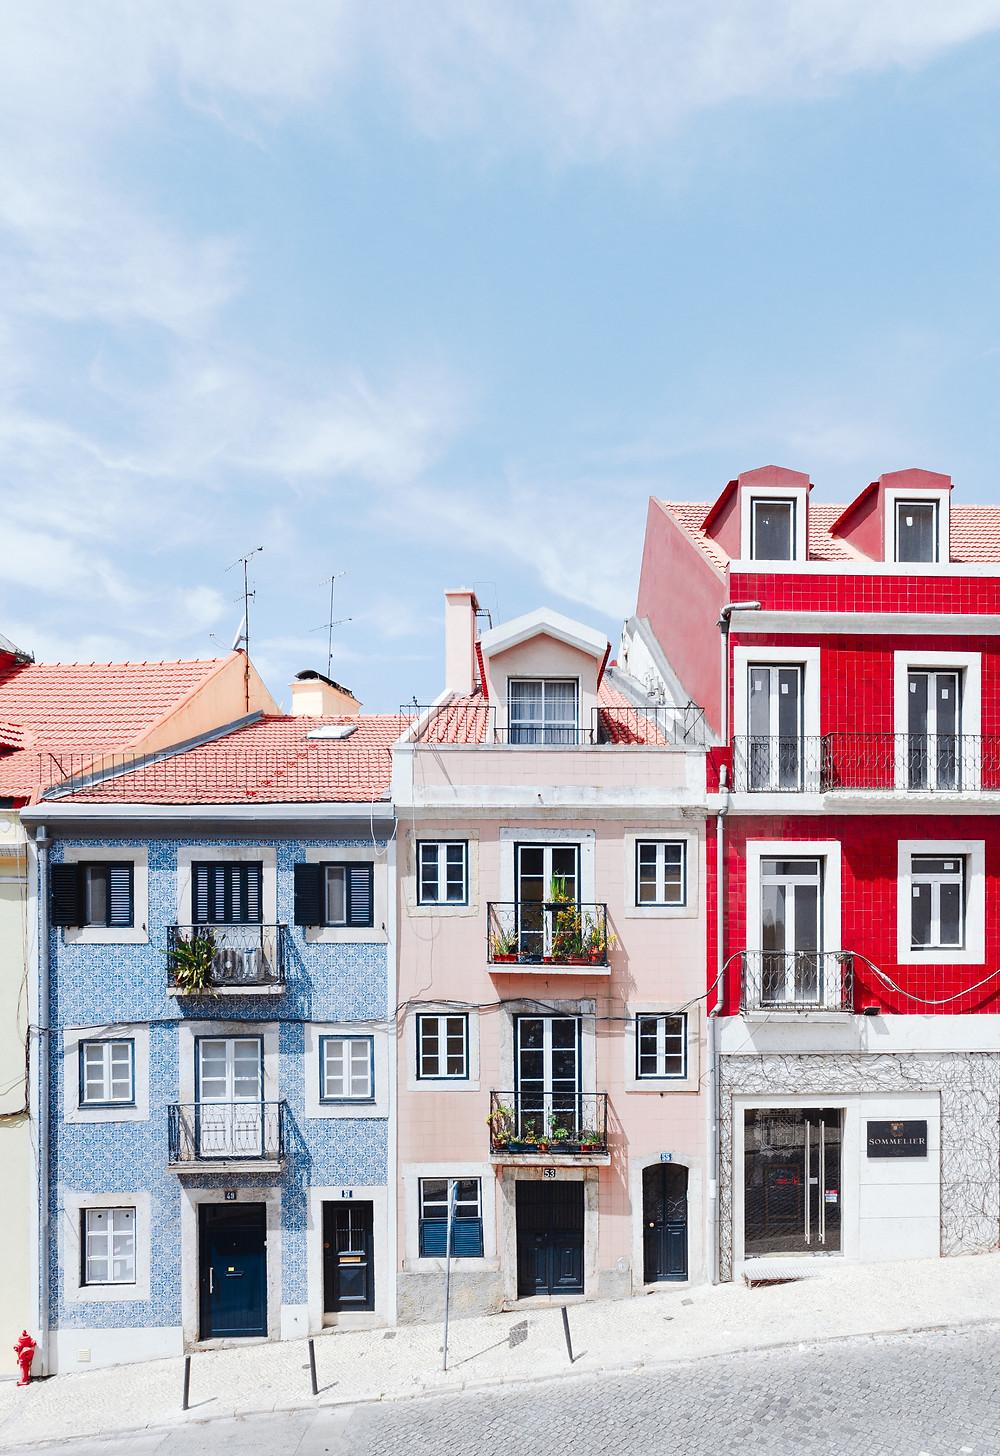 Улицы Лиссабона, Португалия